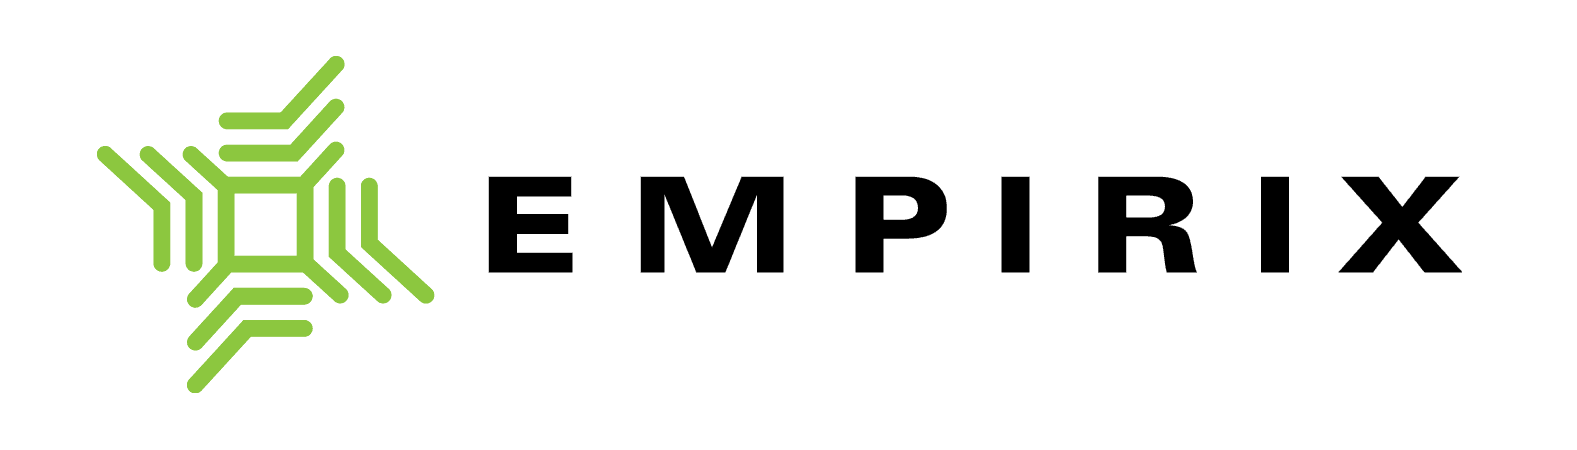 Empirix logo blacktext large